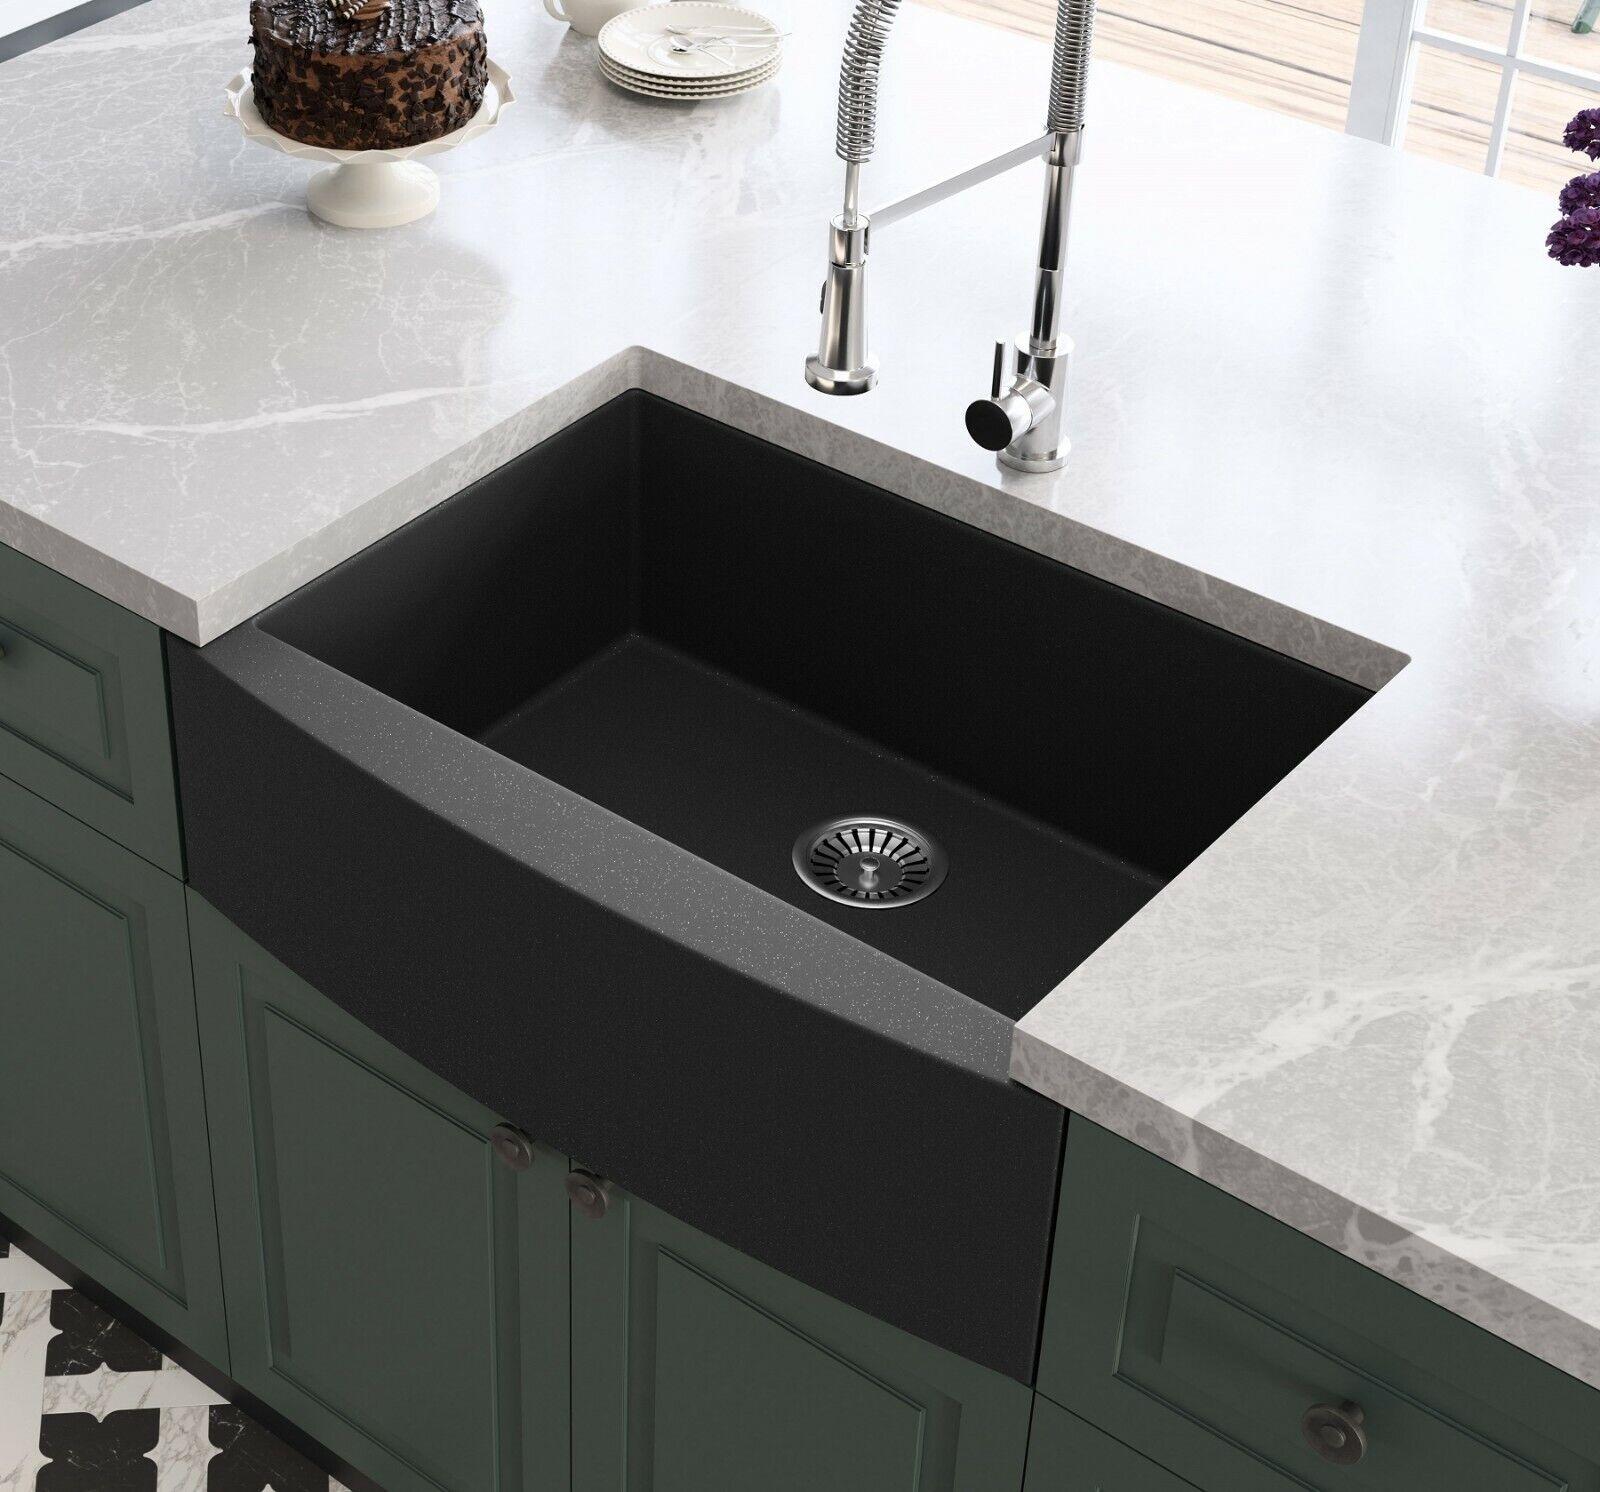 Black Farmhouse Sink Granite Composite Apron Front Sink Single Bowl